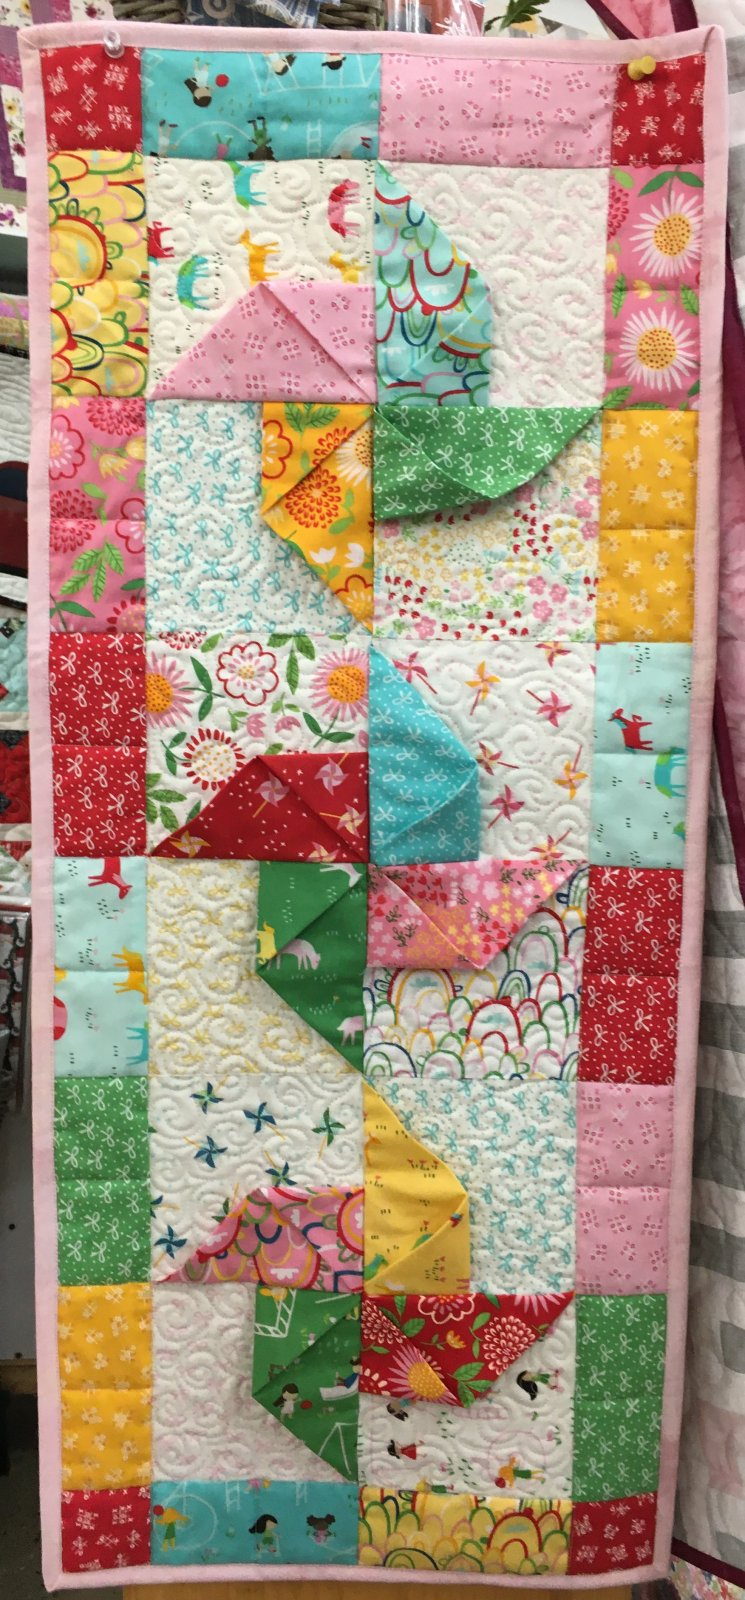 Quilt Sample 3D Pinwheel  13 x 31